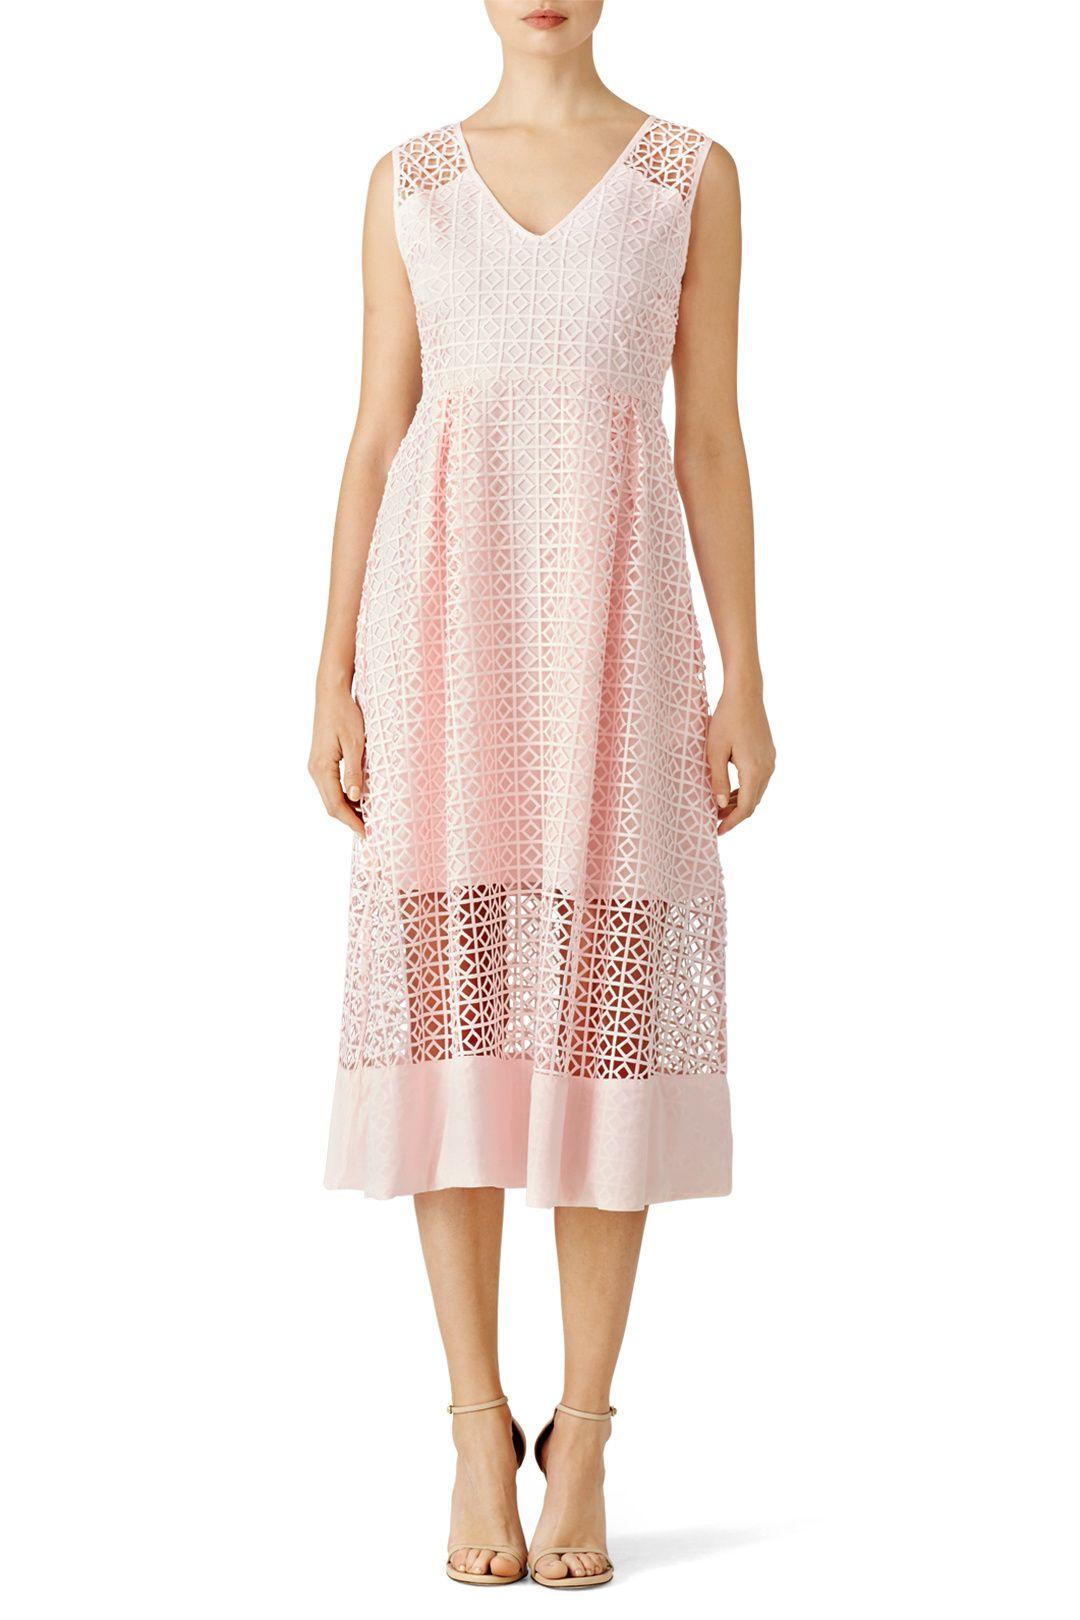 ST by Olcay Gulsen Blush Geometric Lace Dress | WEDDING INSPIRATION ...